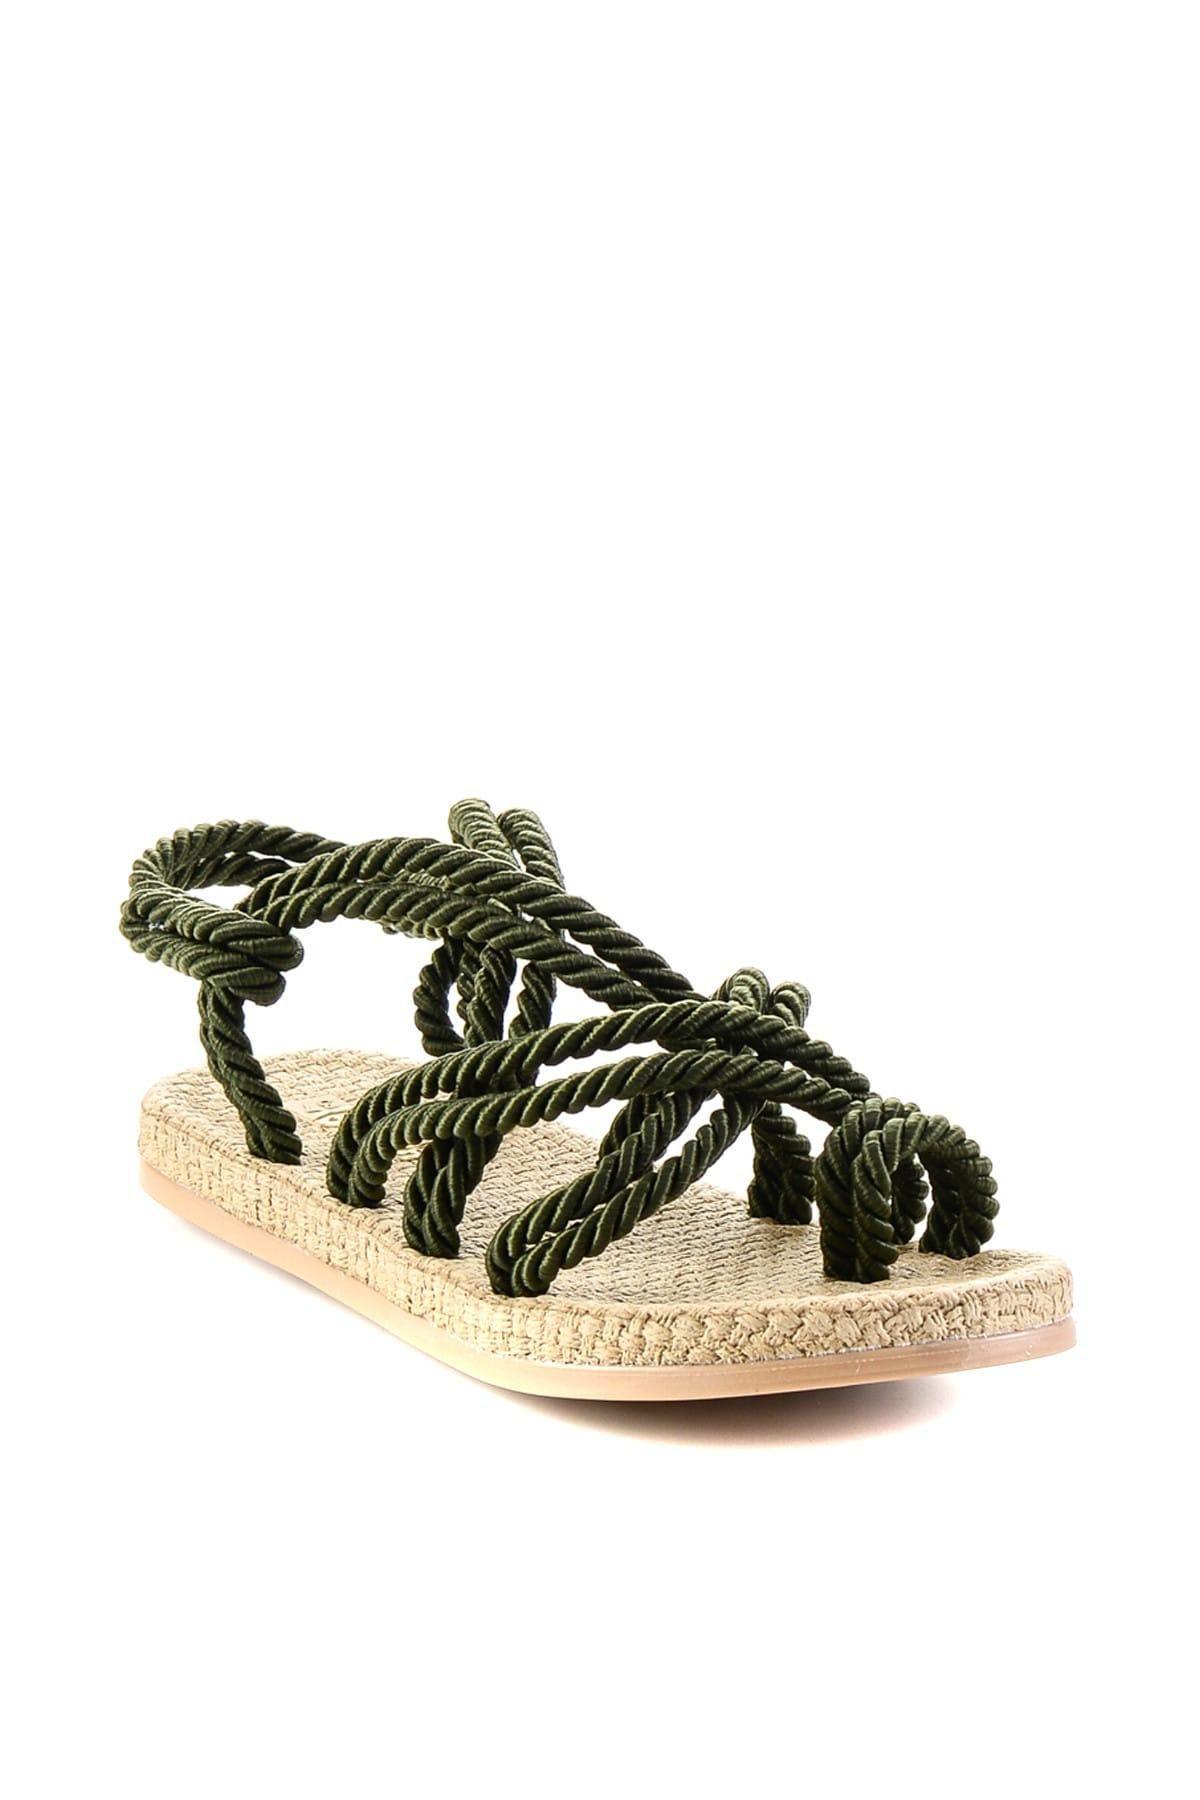 Bambi Khaki Women 'S Sandals H05780101